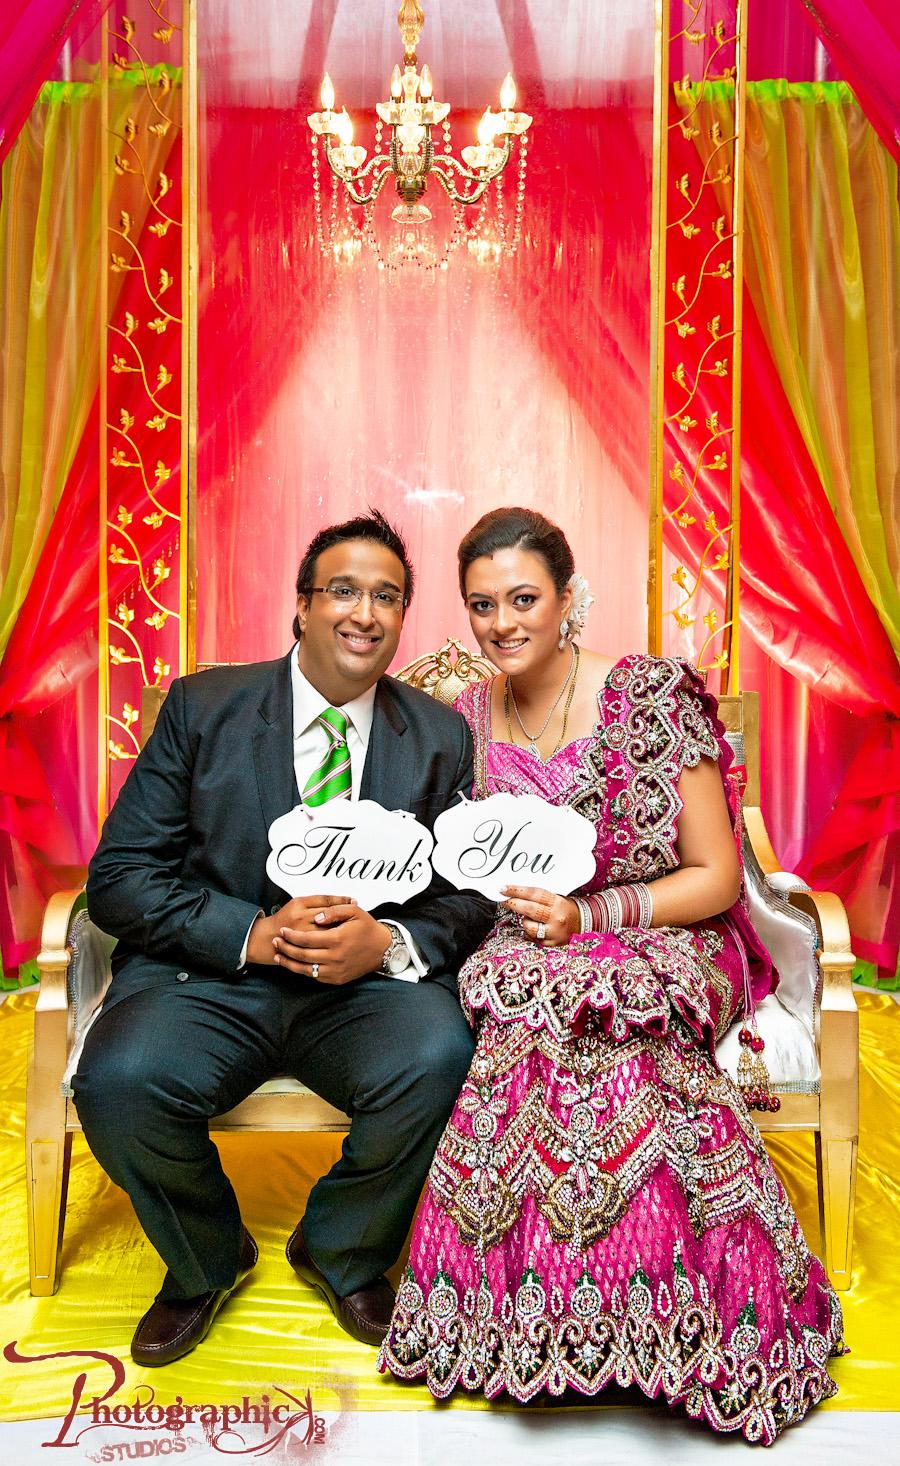 BWI Marriott Wedding of Rohit and Priya